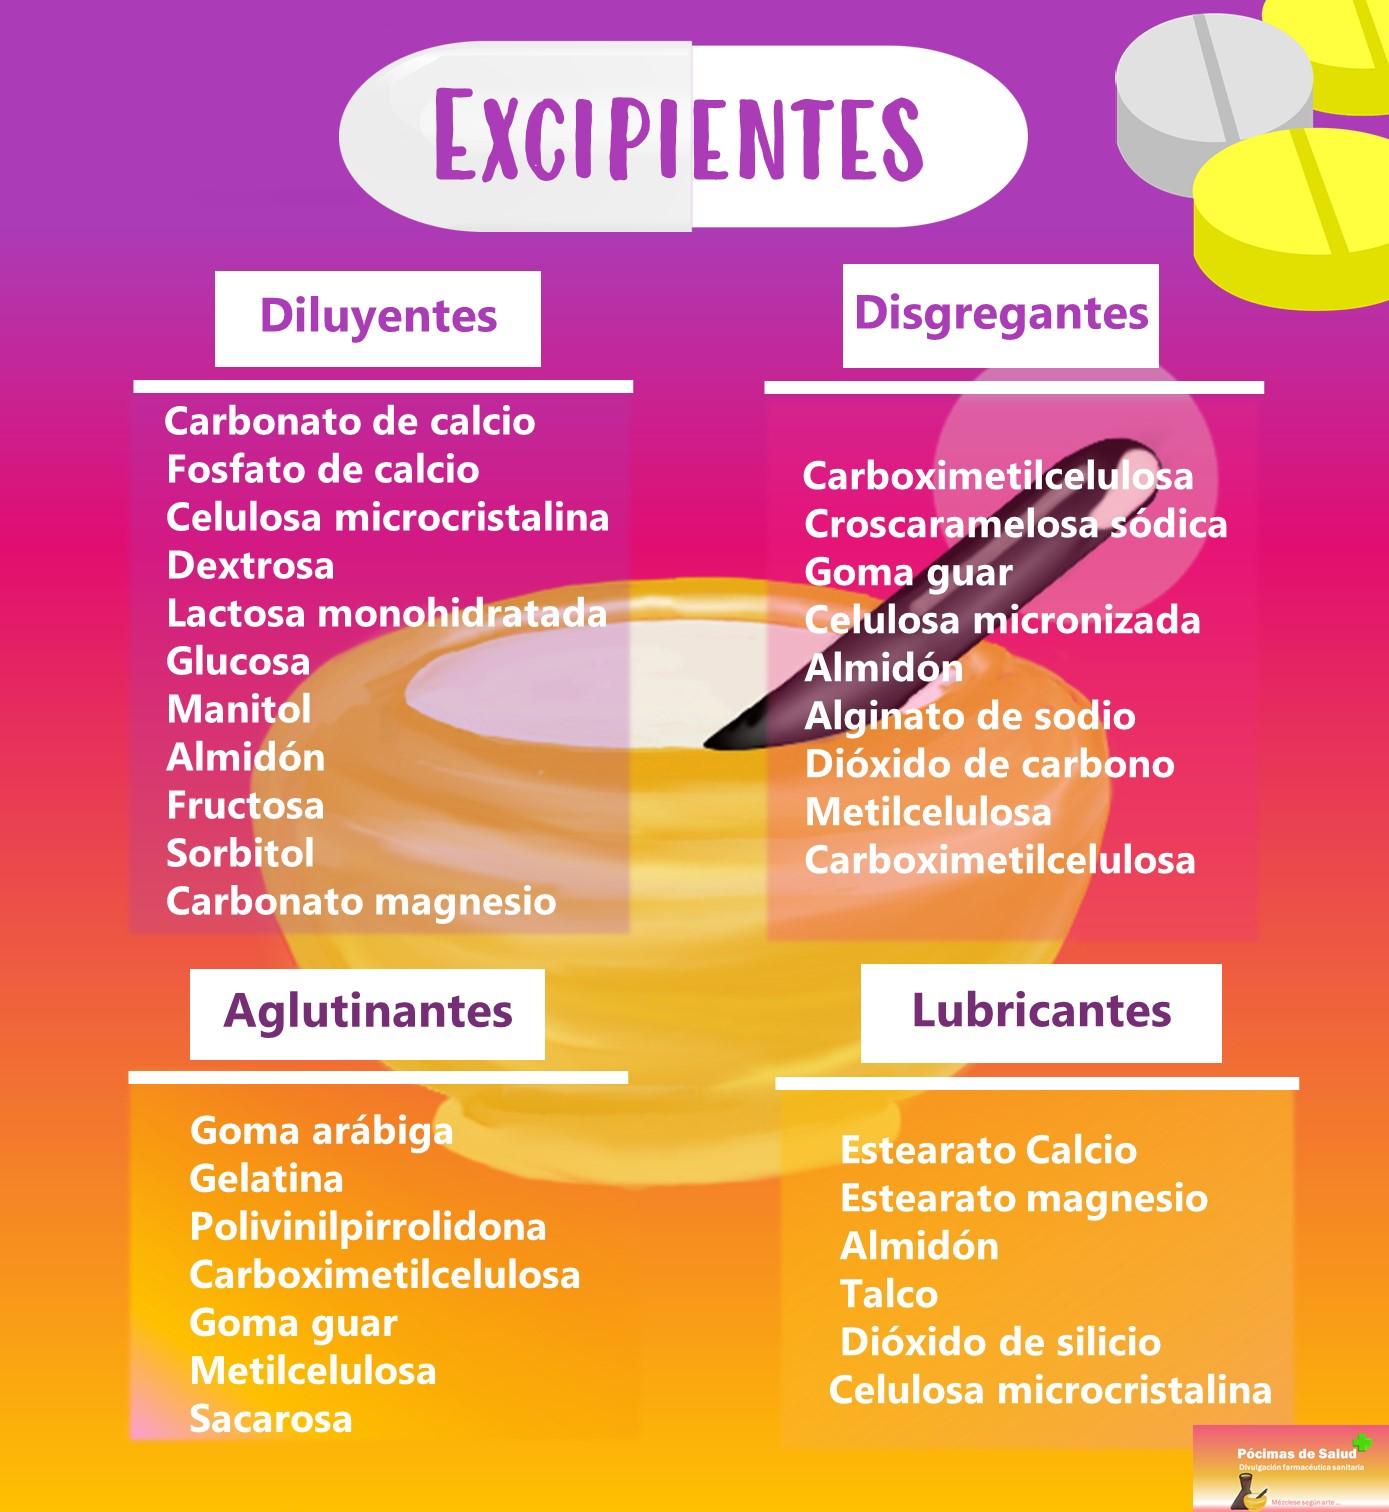 Excipientes-diluyentes-disgregantes-aglutinantes-lubricantes